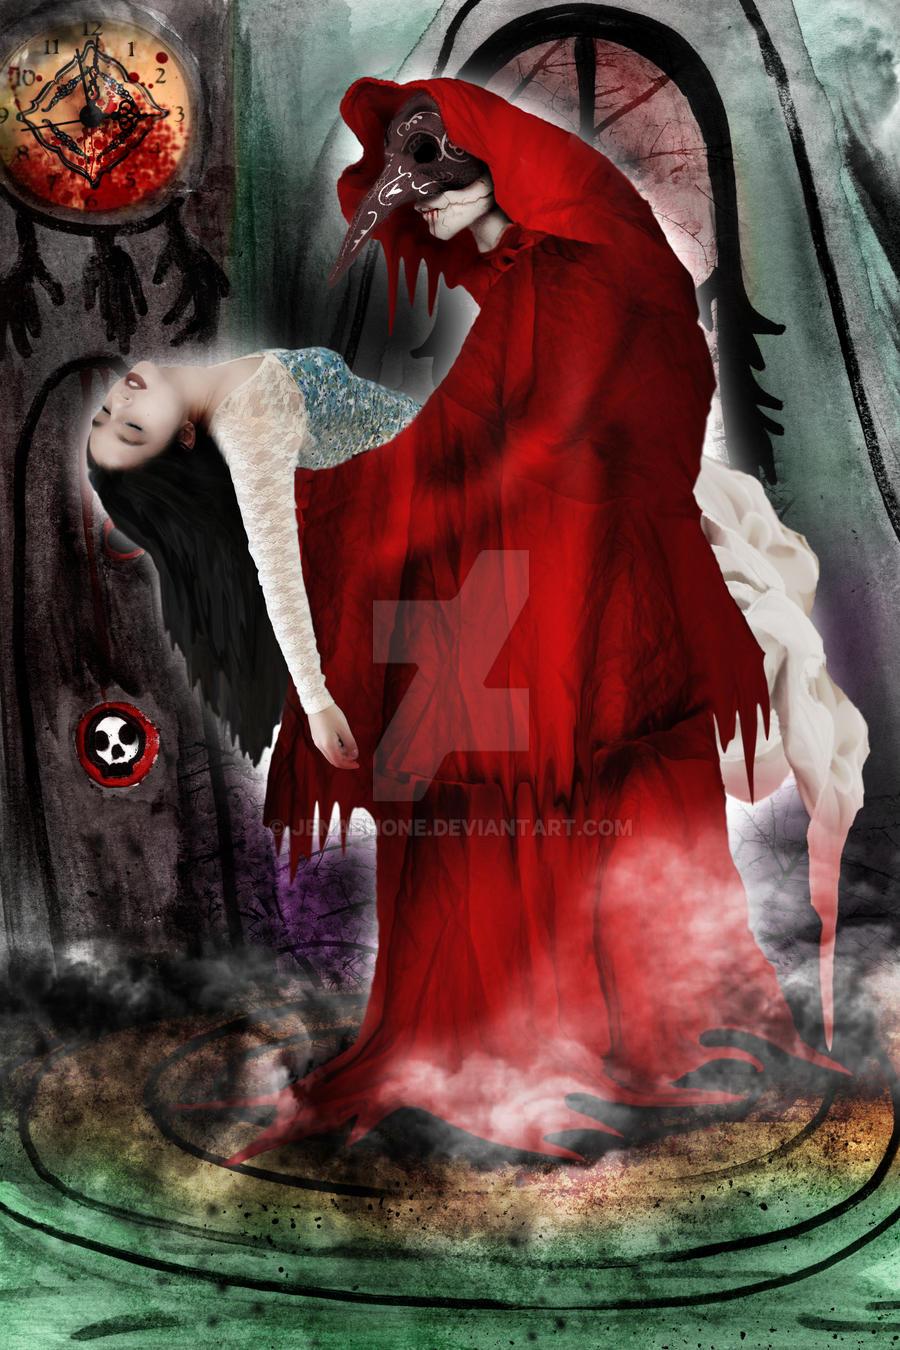 Edgar Allan Poe's Masque of The Red Death by jenabhone on DeviantArt